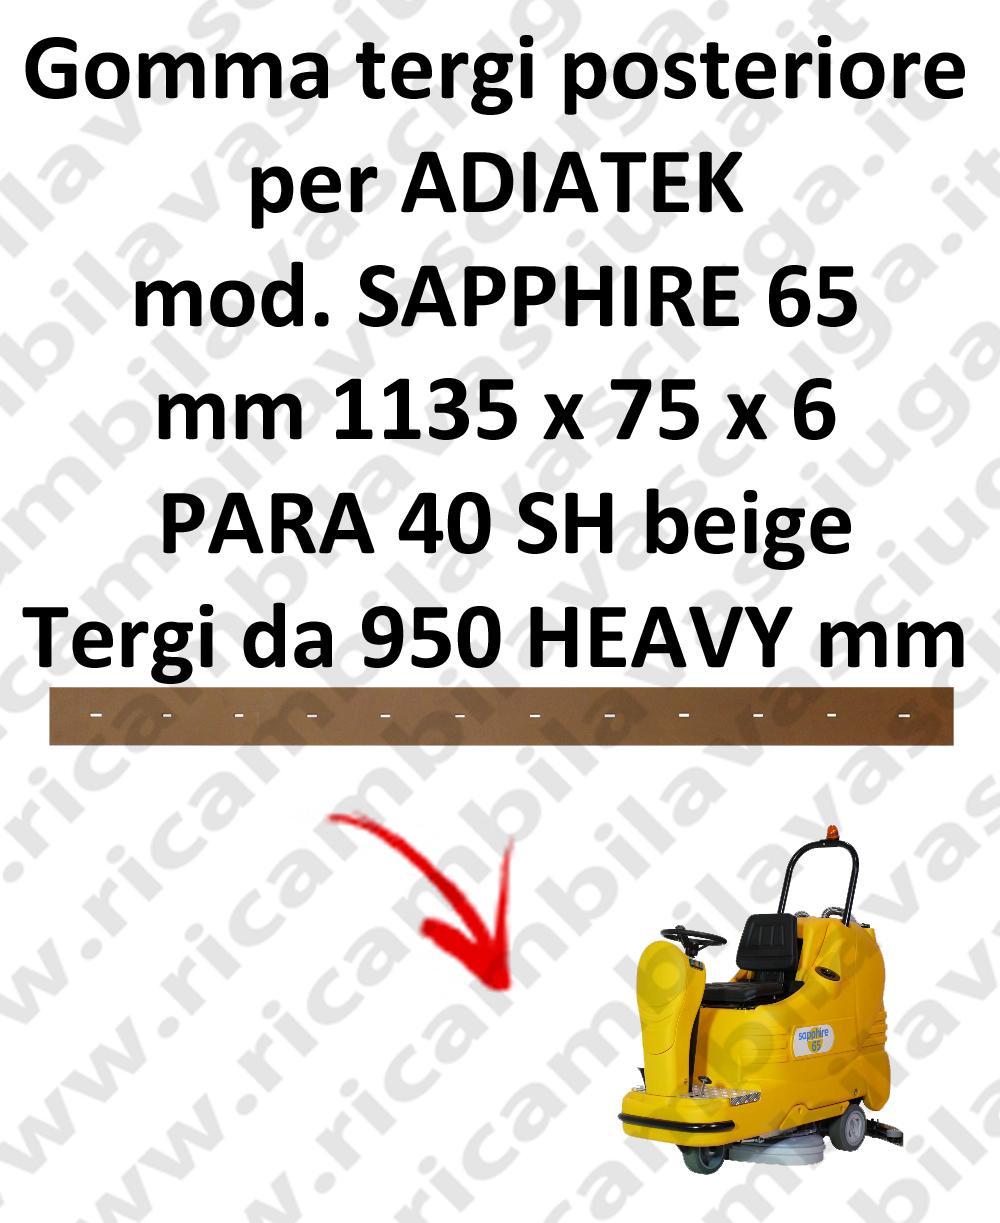 GOMMA TERGI posteriore per lavapavimenti ADIATEK SAPPHIRE 65 (tergi da 950 mm)